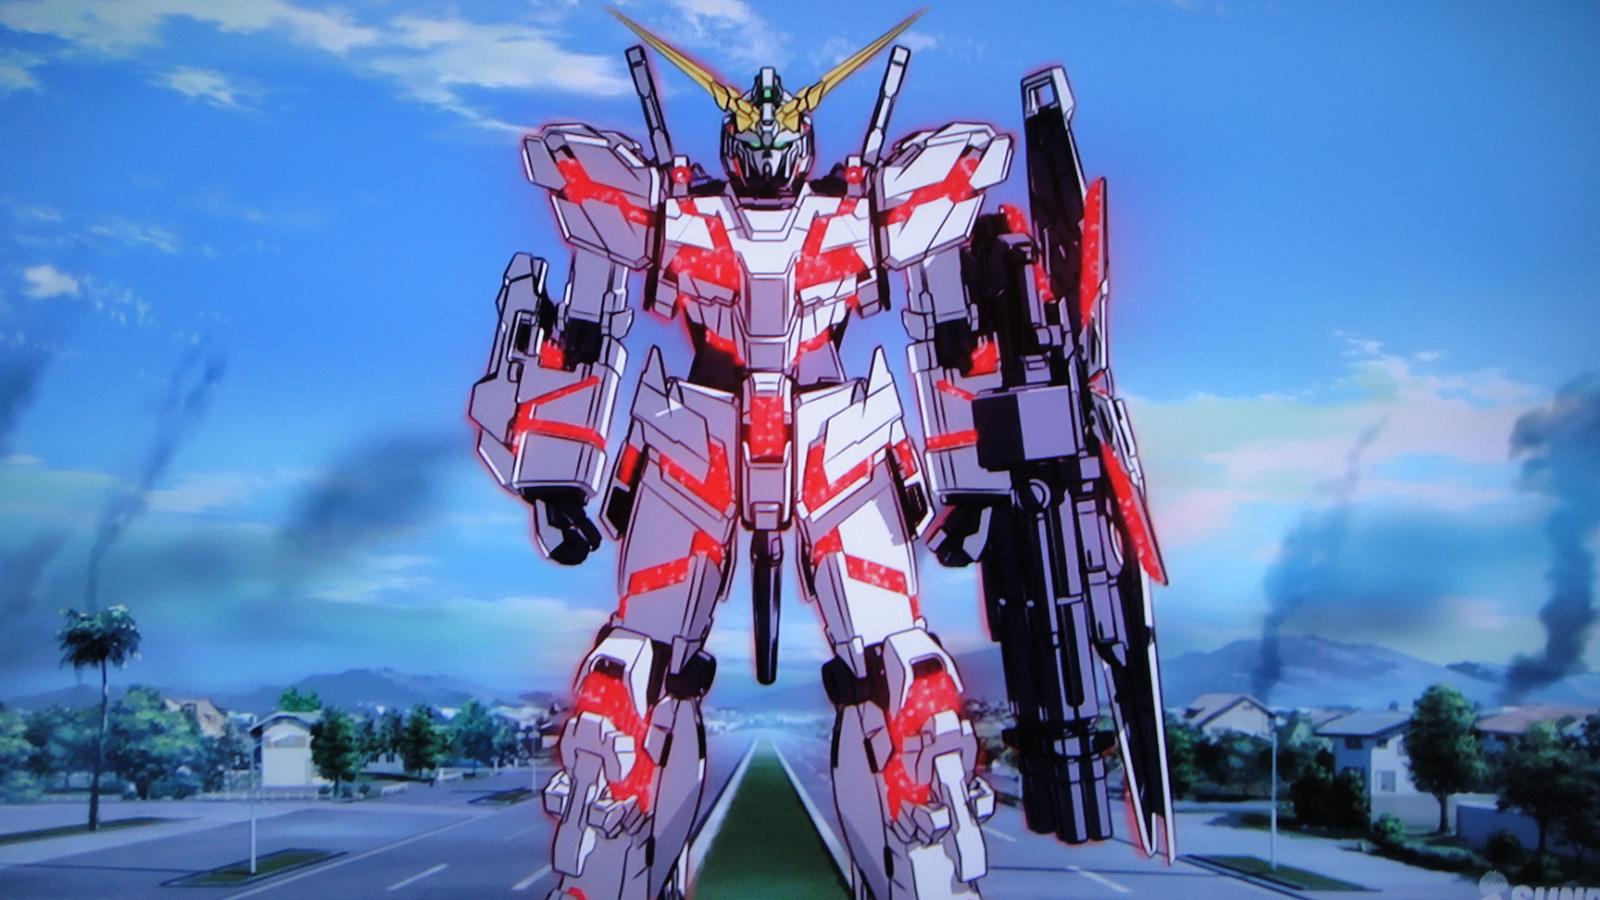 Hd wallpaper unicorn - Filename Mobile Suit Gundam Unicorn 11 Cool Hd Wallpaper Jpg